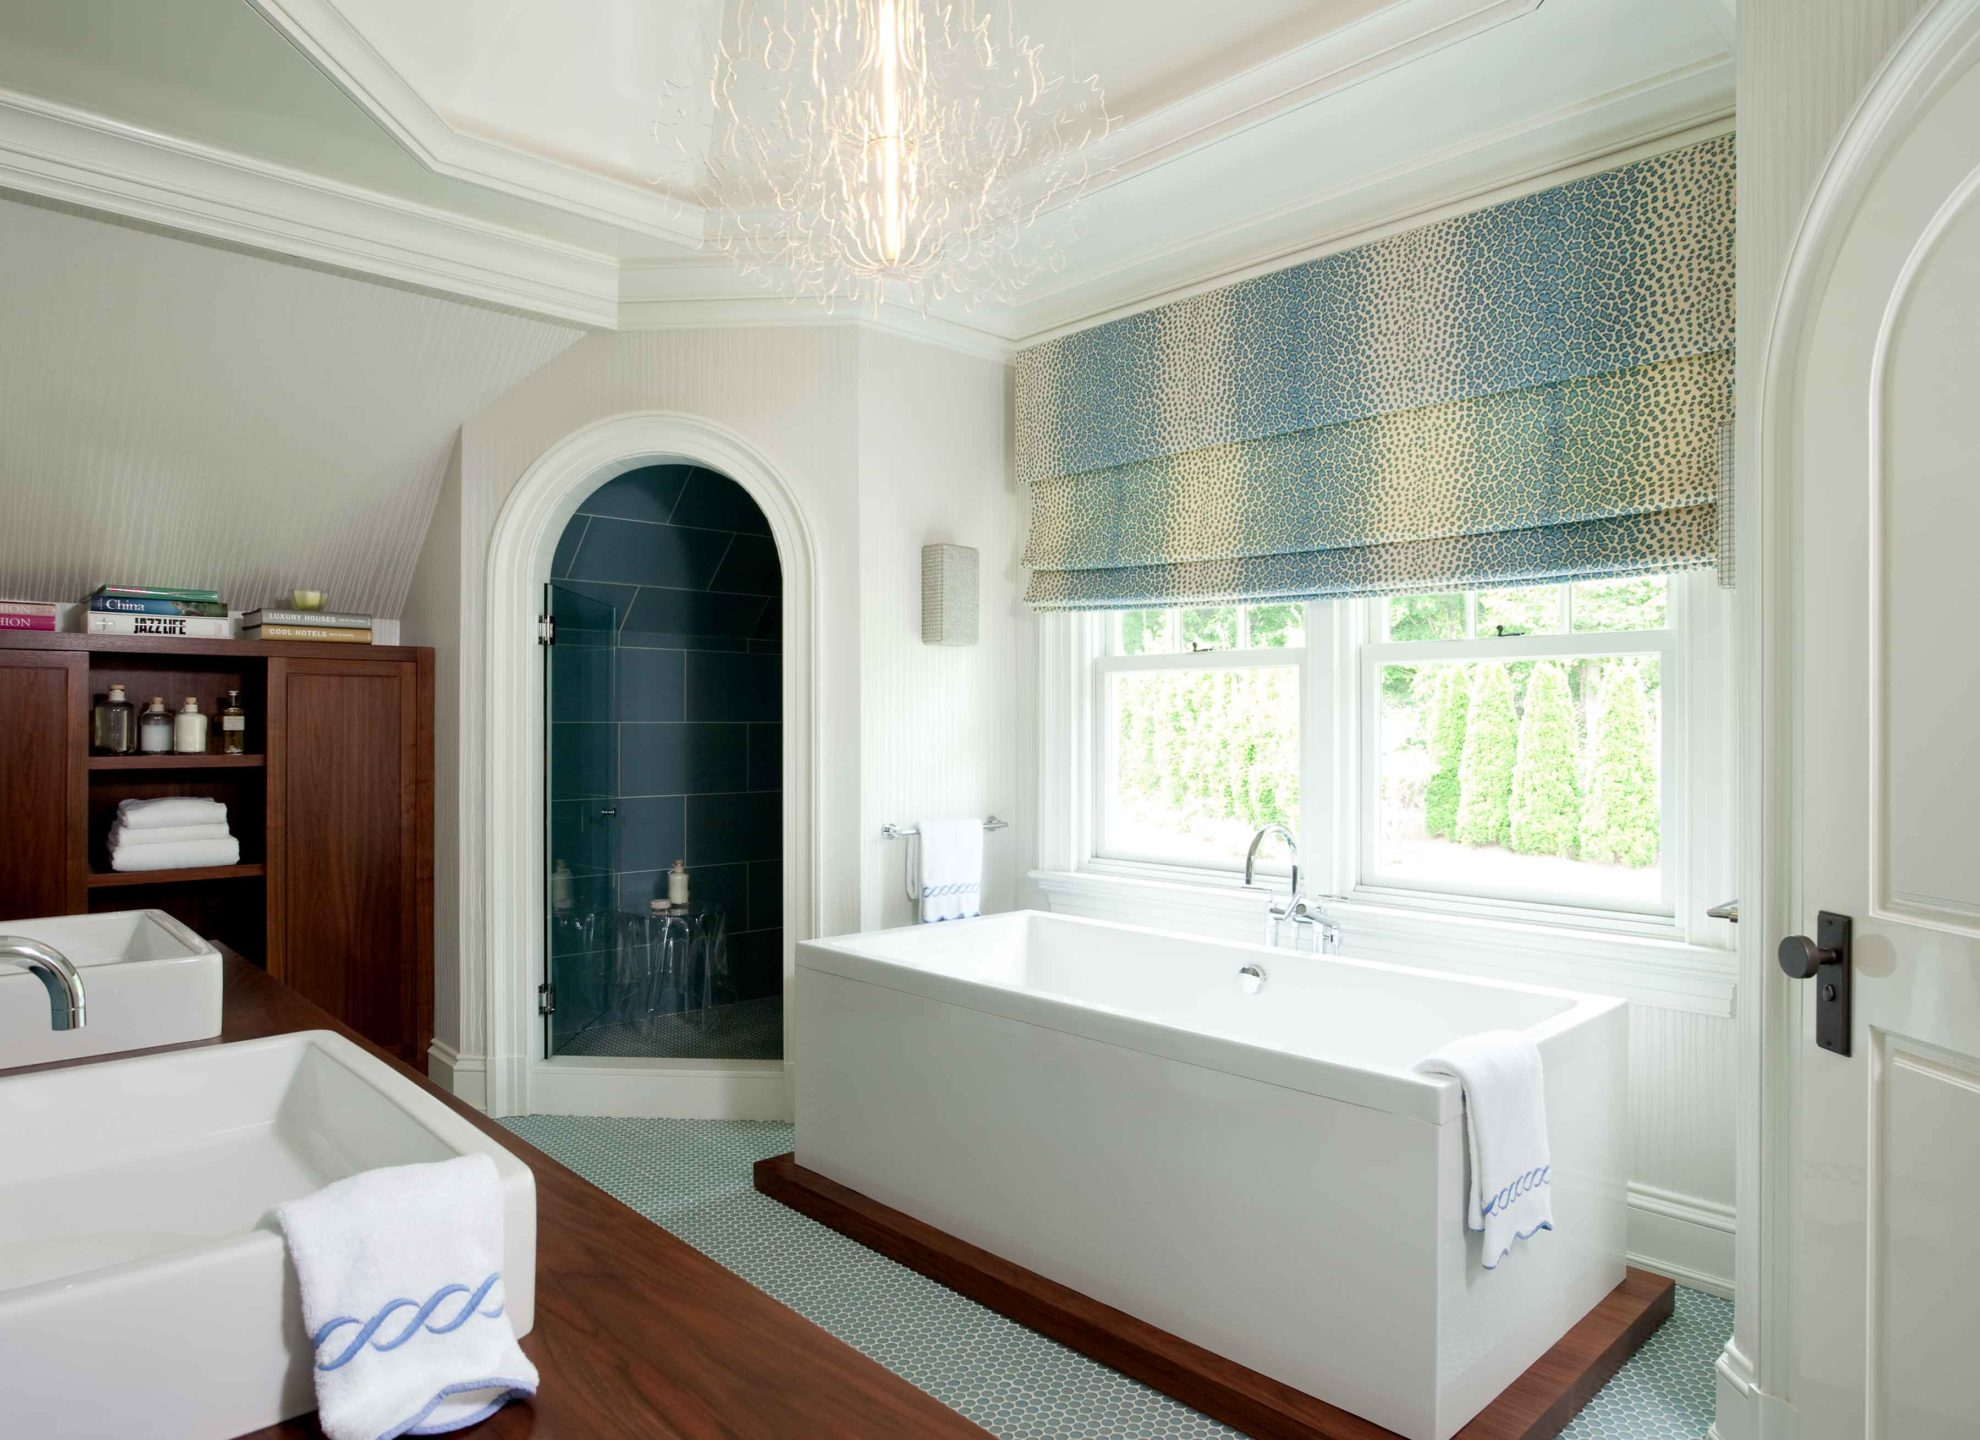 Nicole-Fuller-Interiors-Dutchess-Suffern-Estate-bathroom-rectangular-freestanding-tub-arched-shower-door-new-york-interior-designer